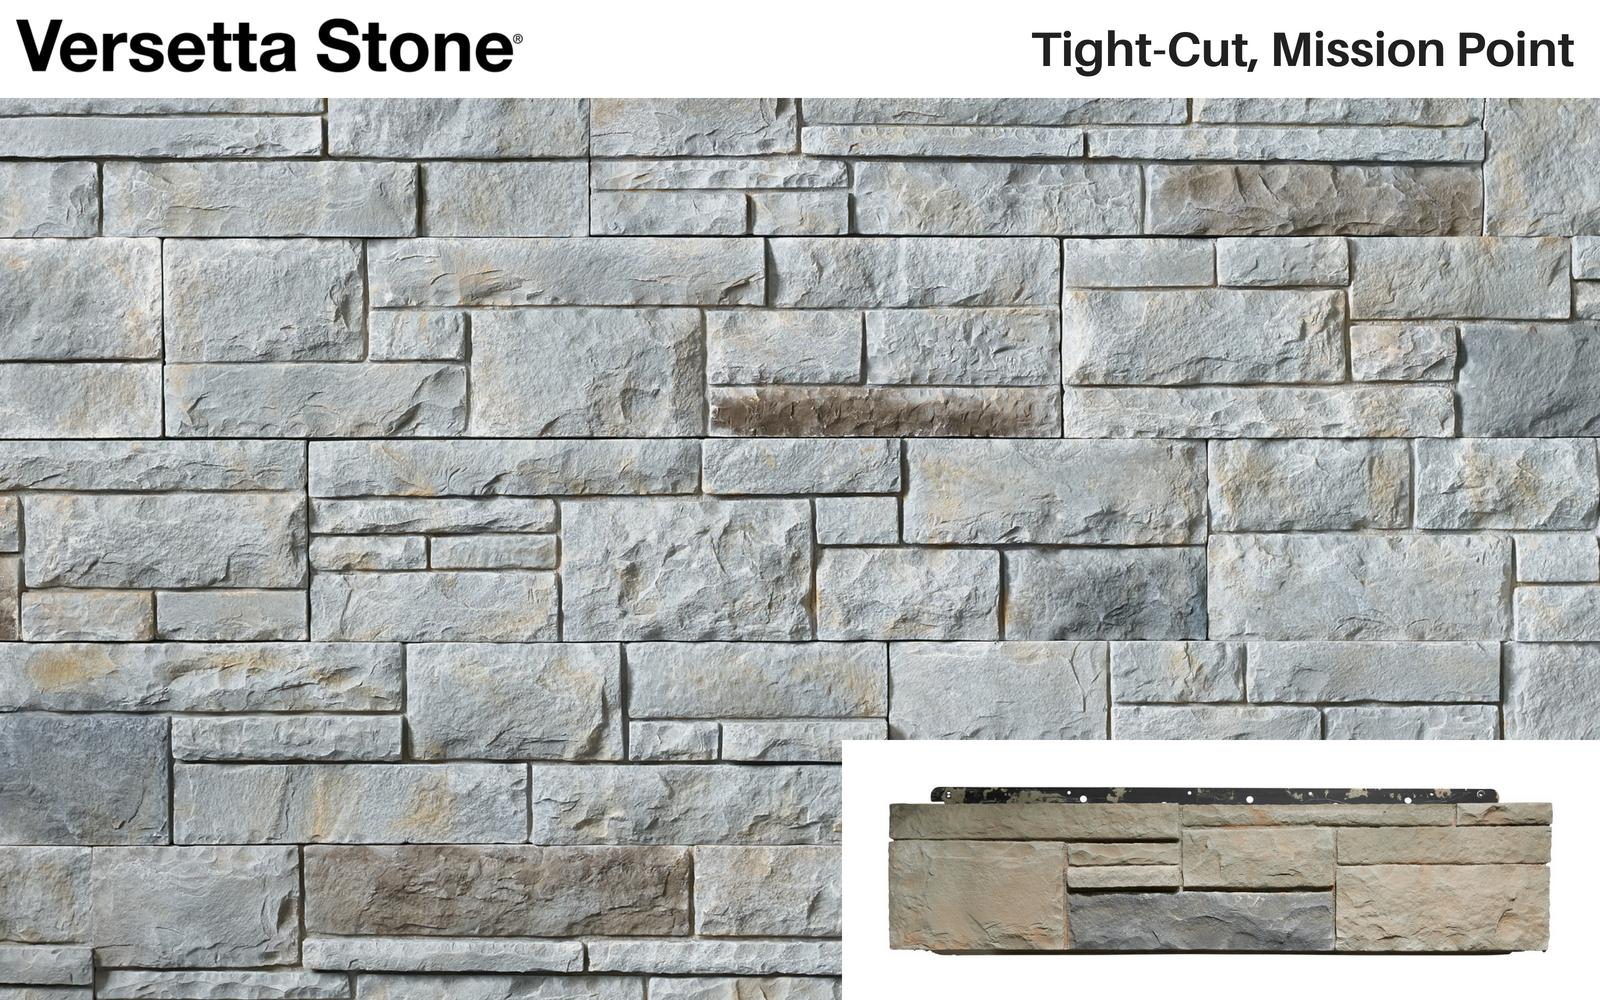 Versetta Stone® - Tight-Cut, Mission Point  Versetta Stone